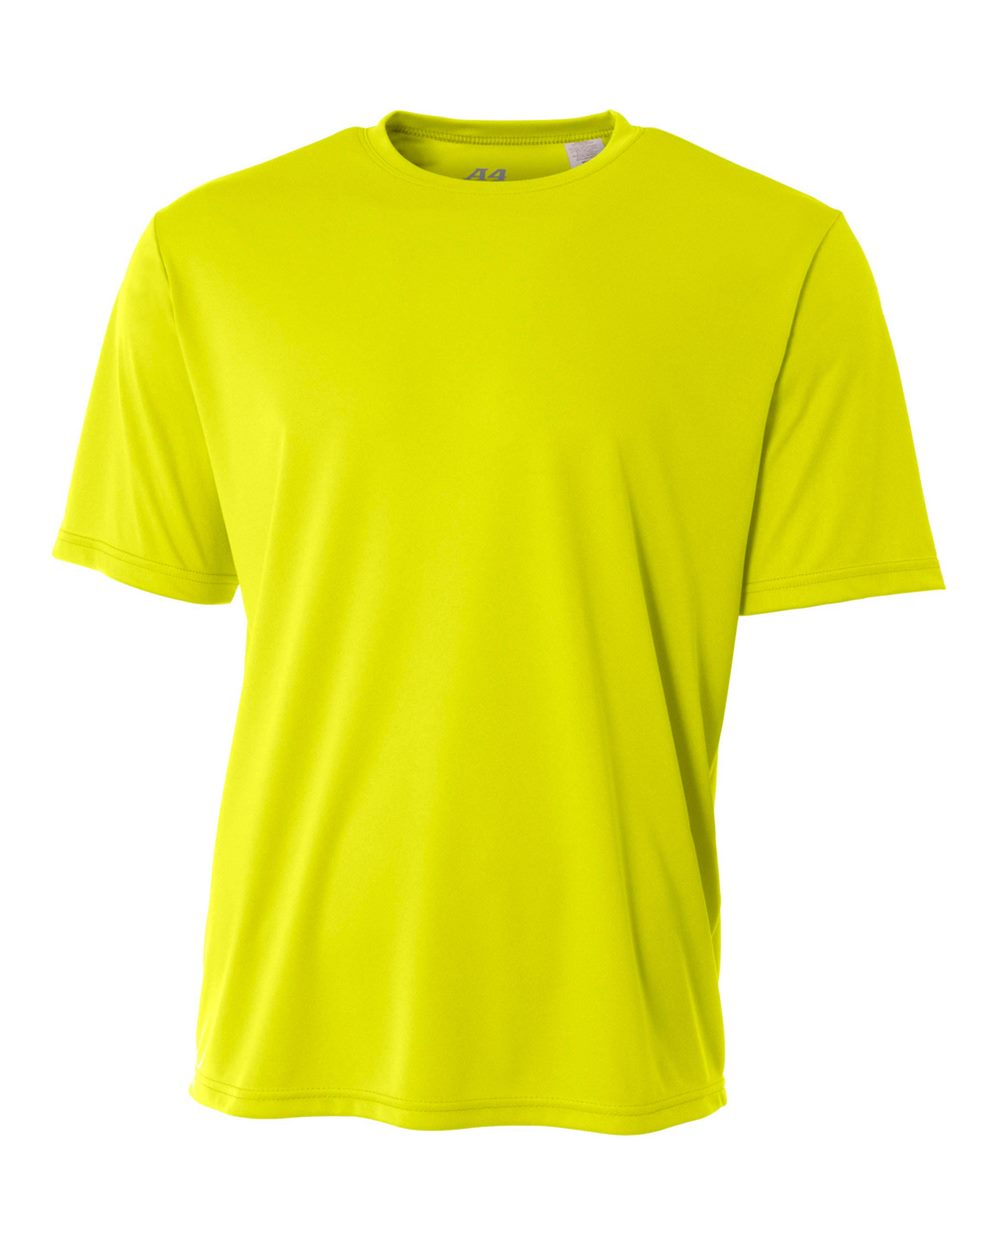 mw-polo-safety-yellow.jpg